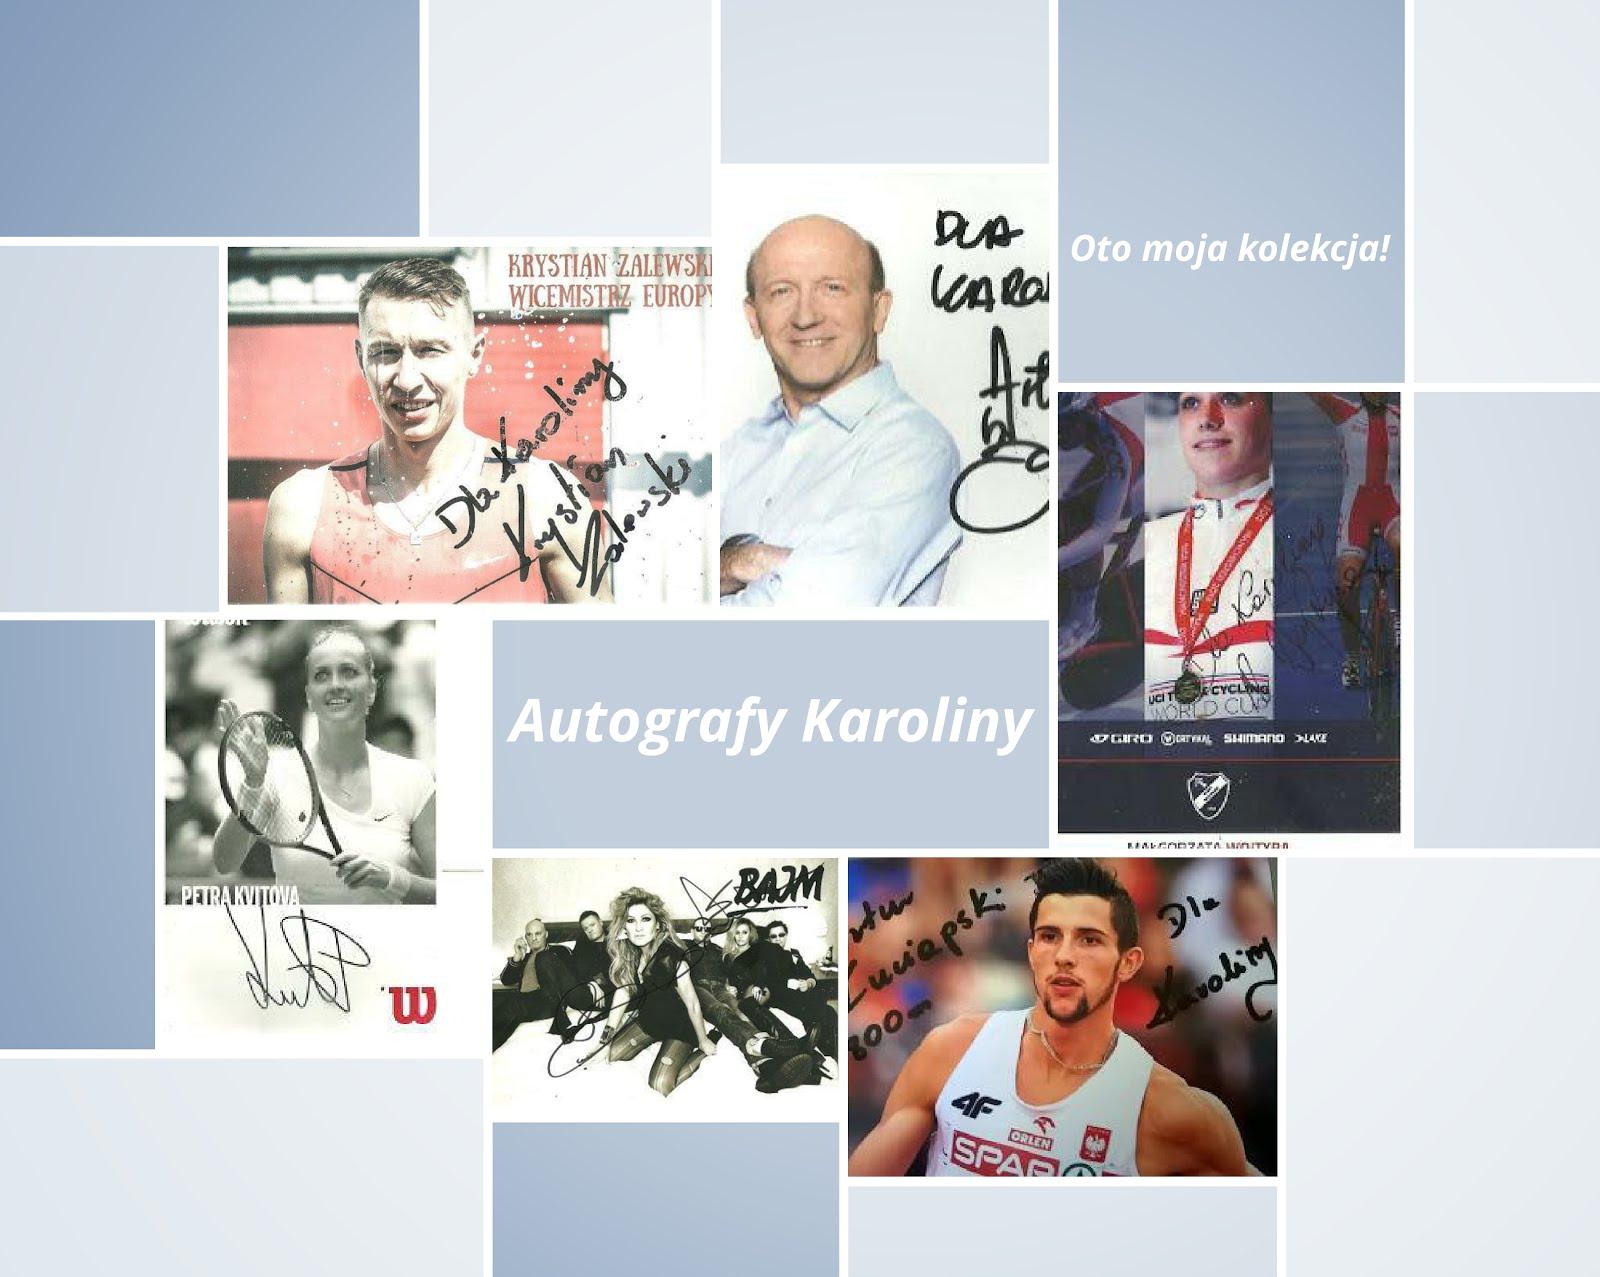 Moja kolekcja autografów